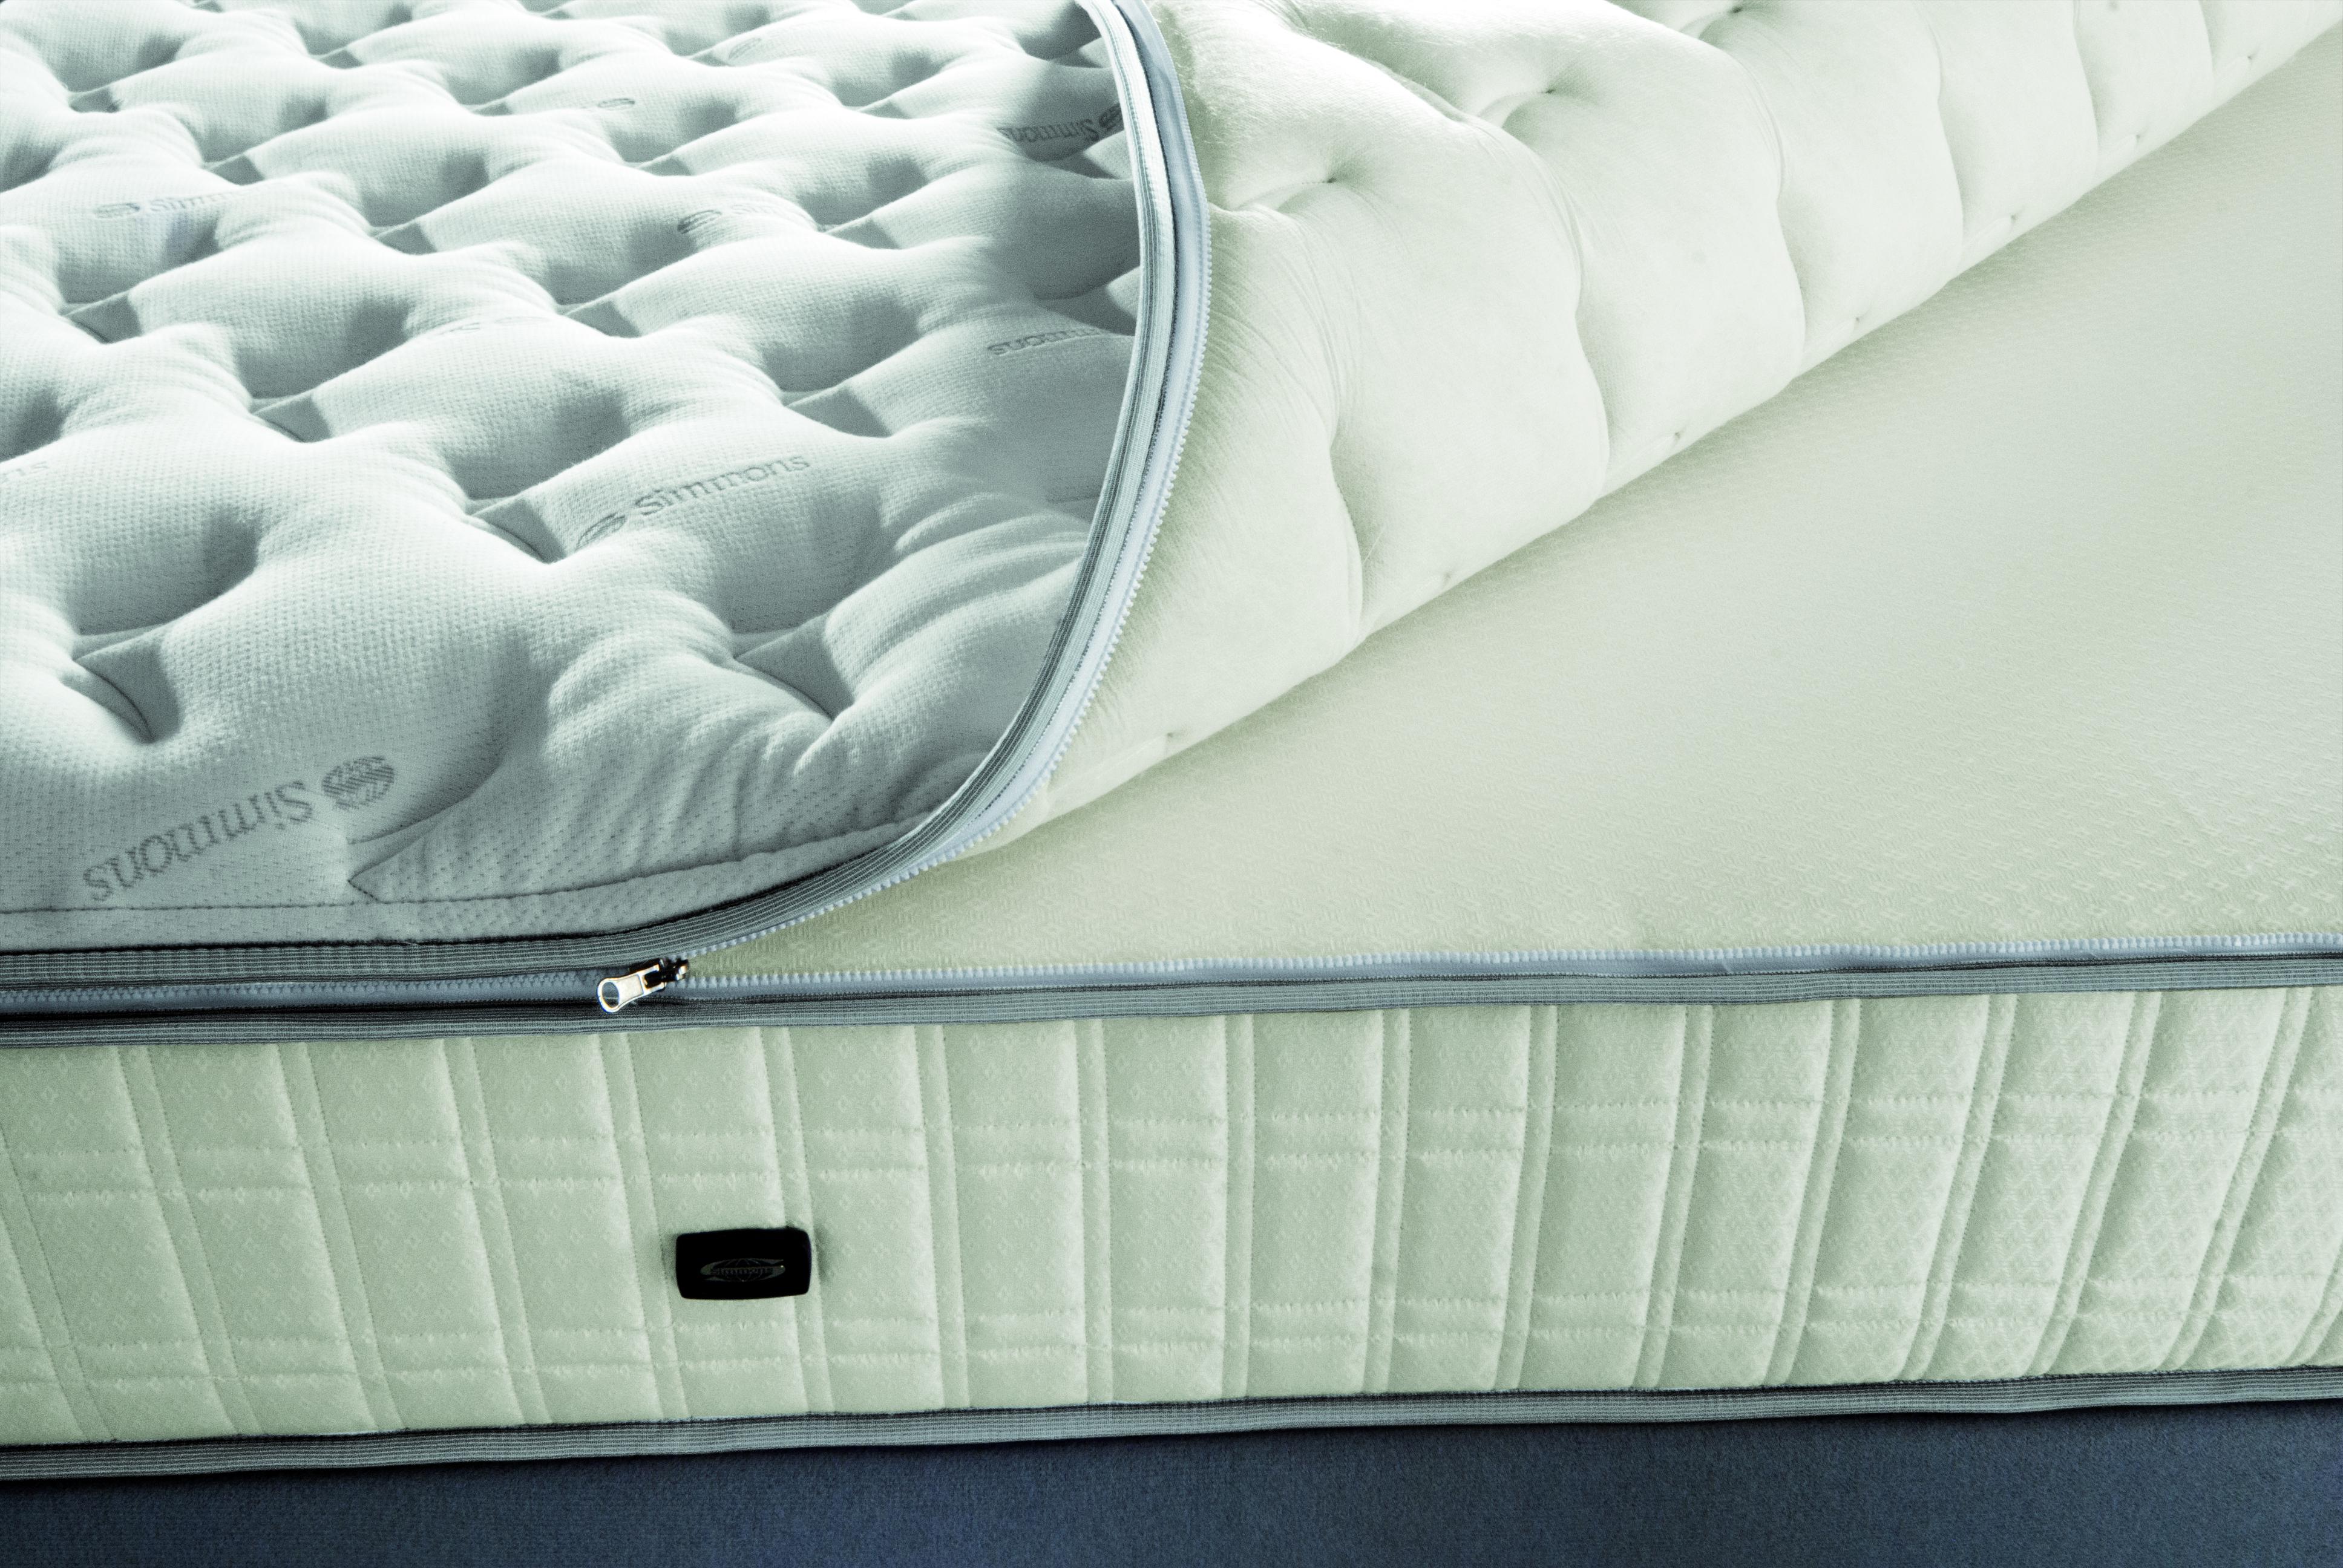 Materasso Simmons Platinum Beautyrest no-flip con Pillow Top Renew, rimovibile con cerniere longitudinali